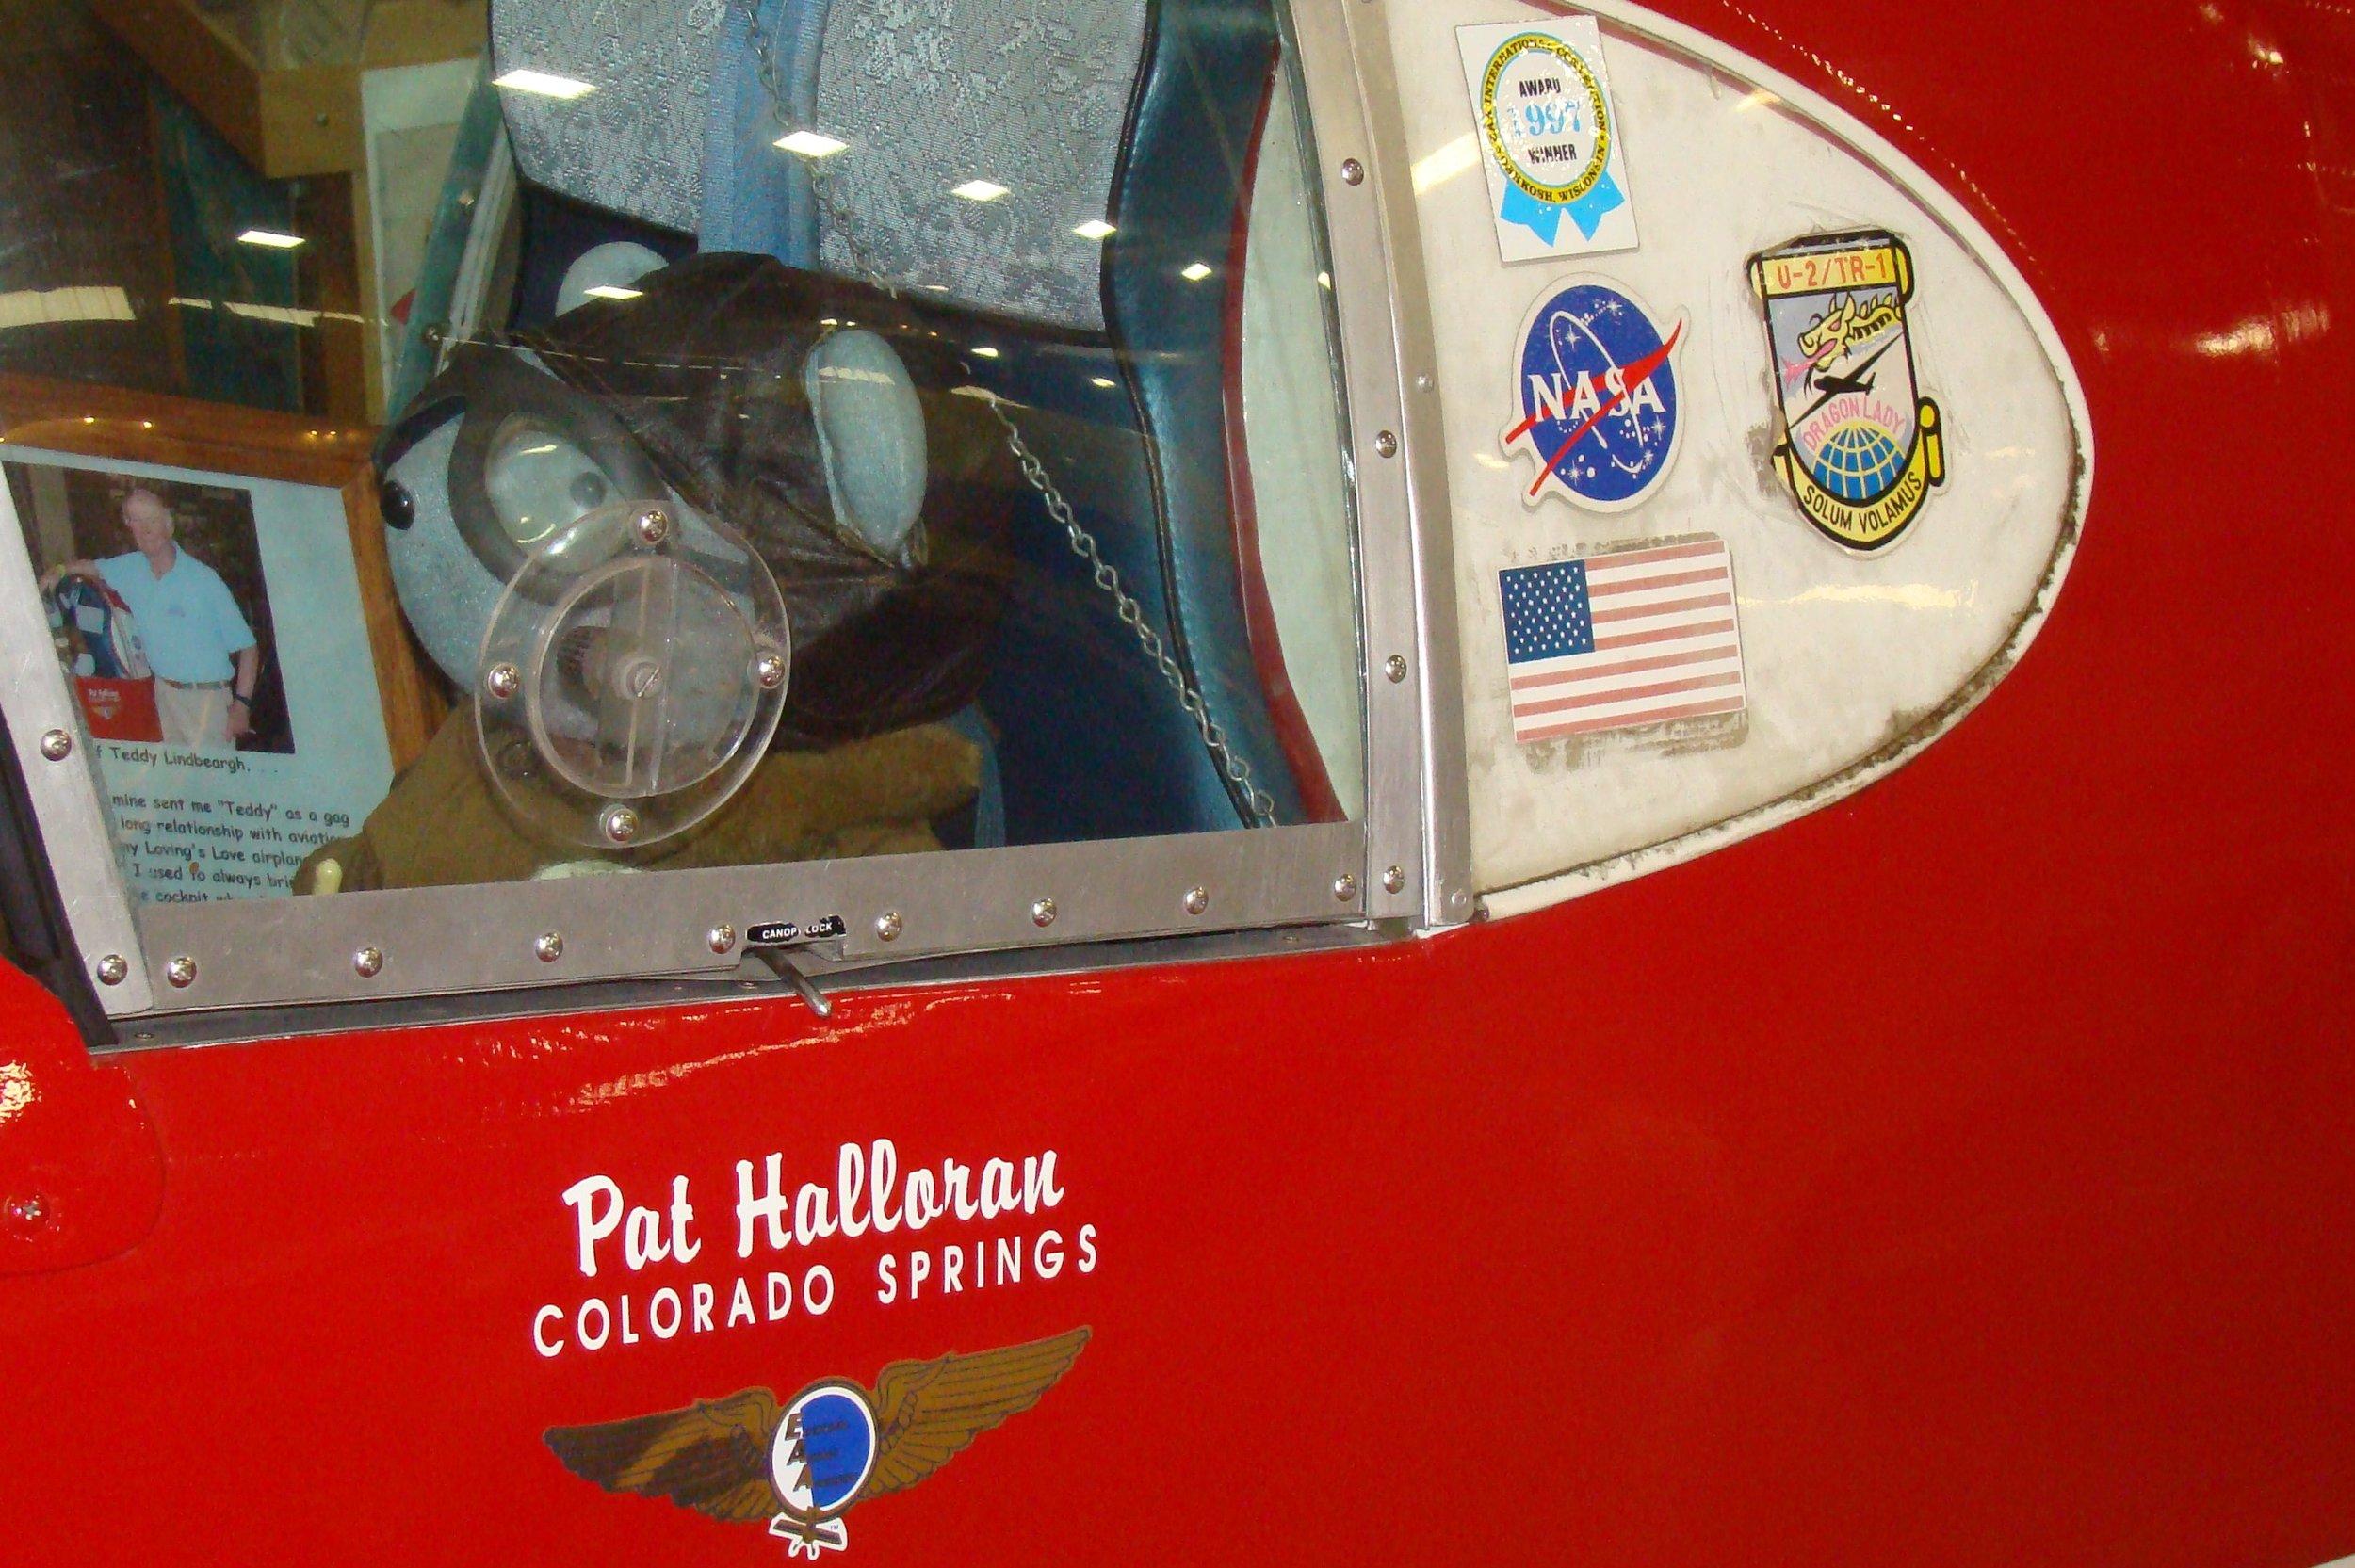 Pat Halloran's Cockpit IDs, 28 Jan '12.JPG